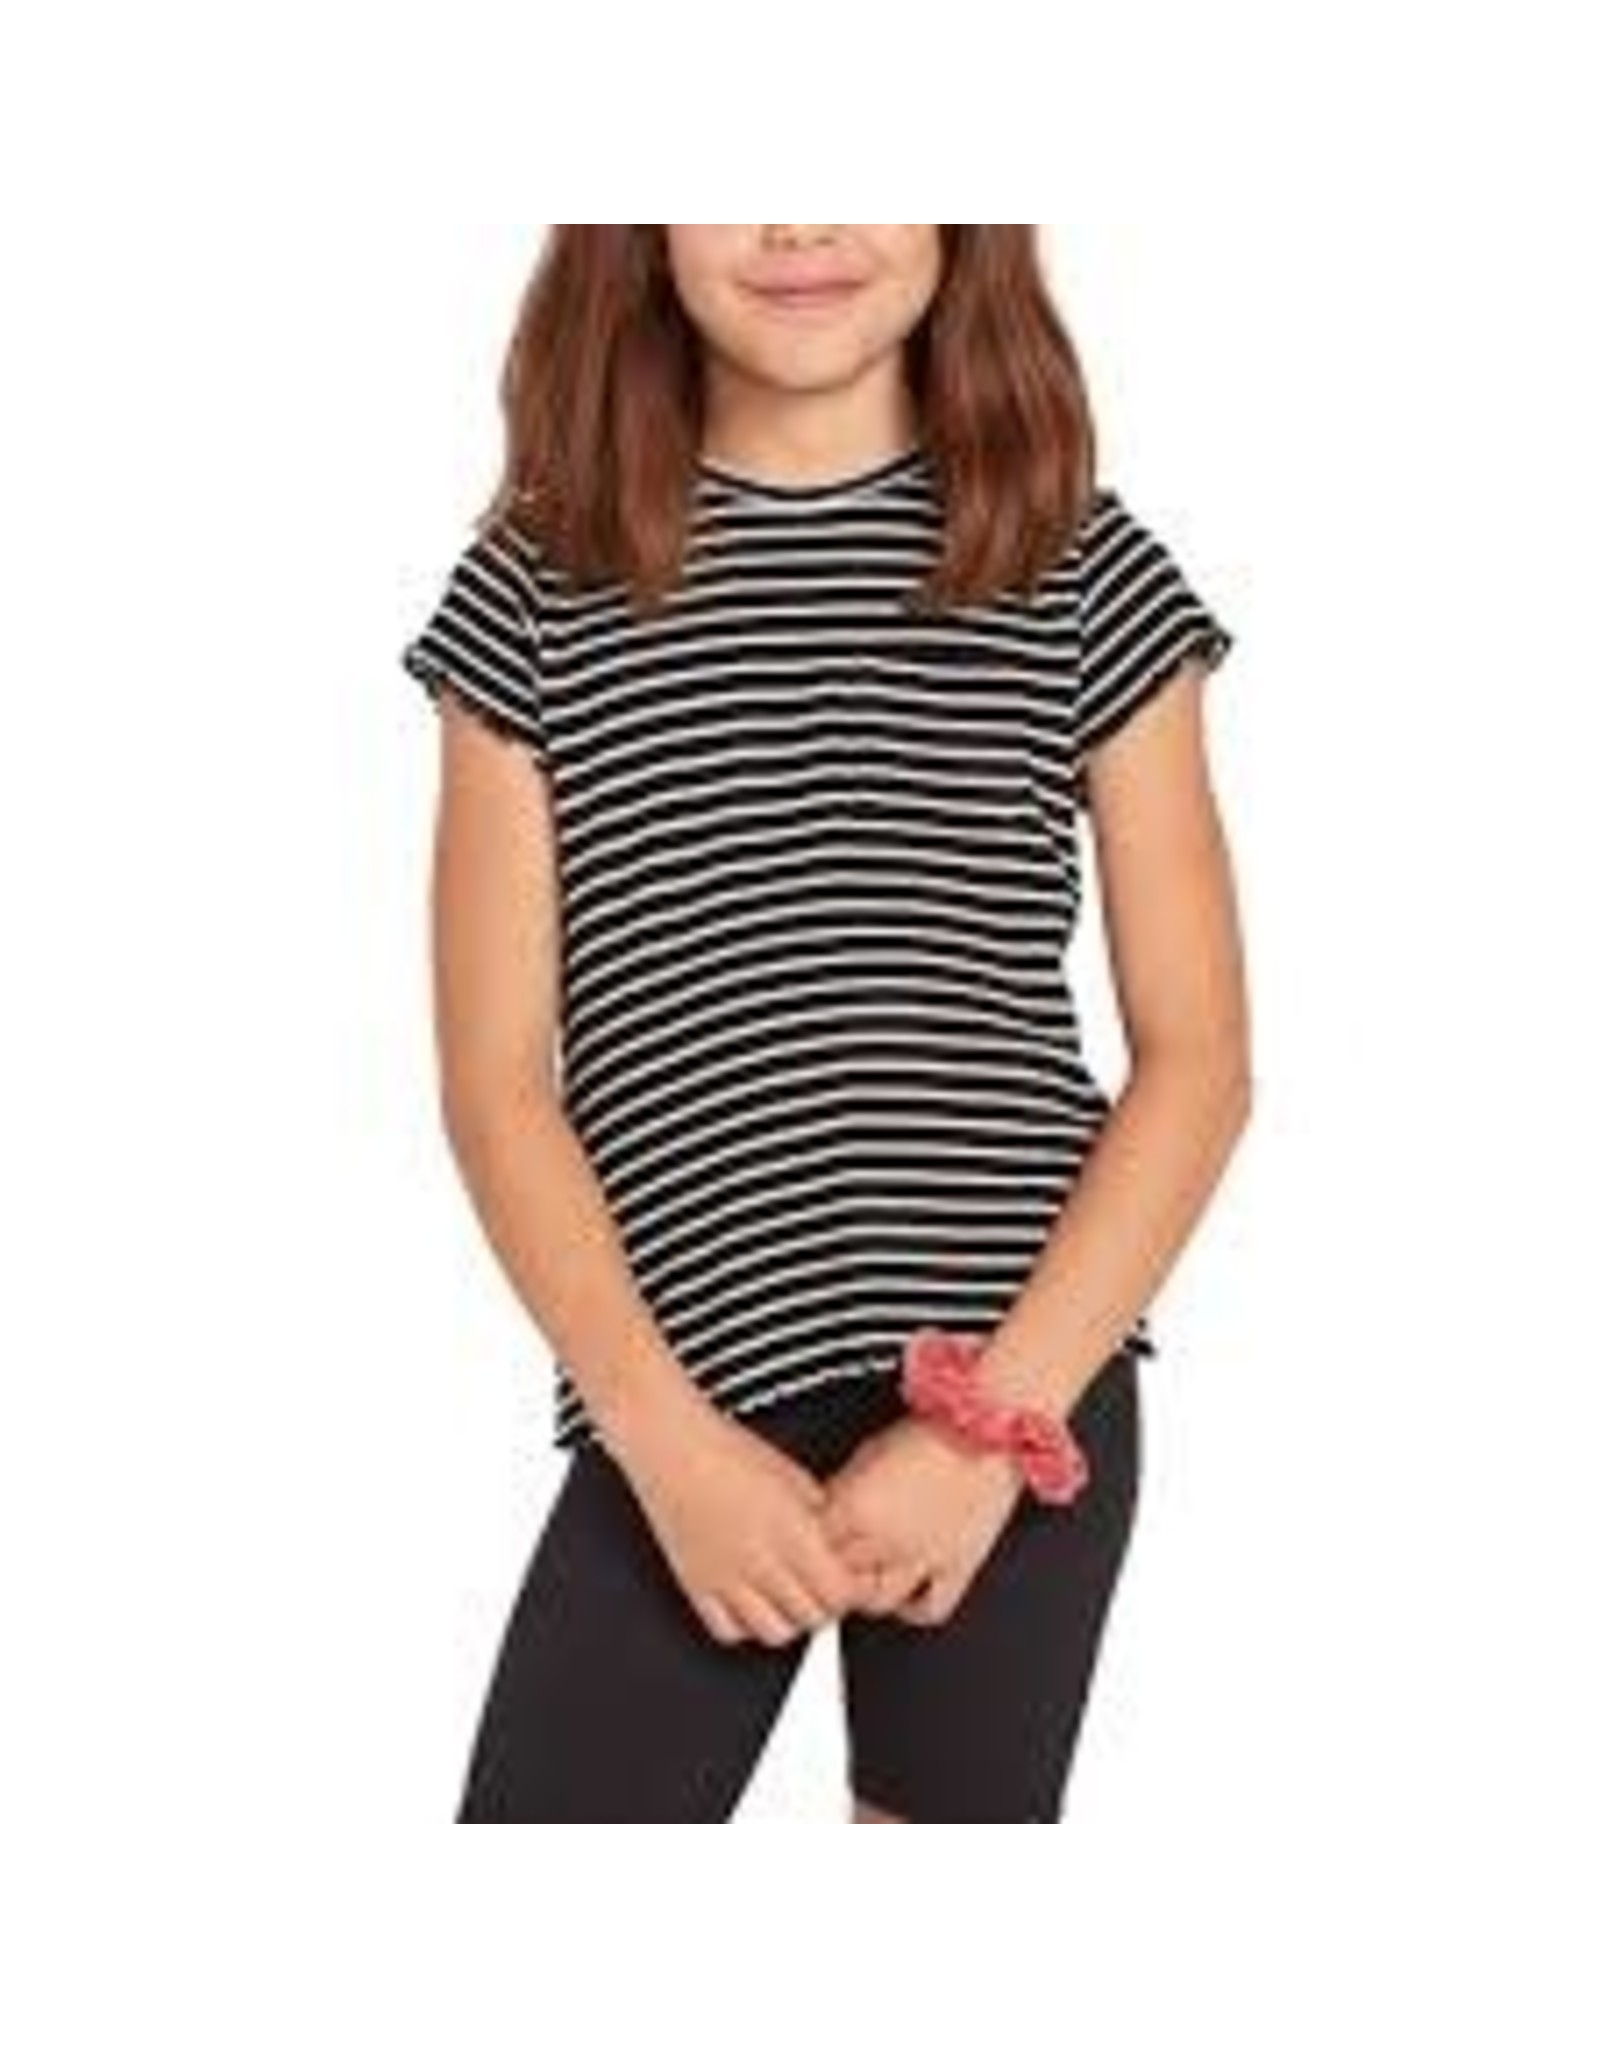 volcom Volcom - T-shirt fille dayze day black/white